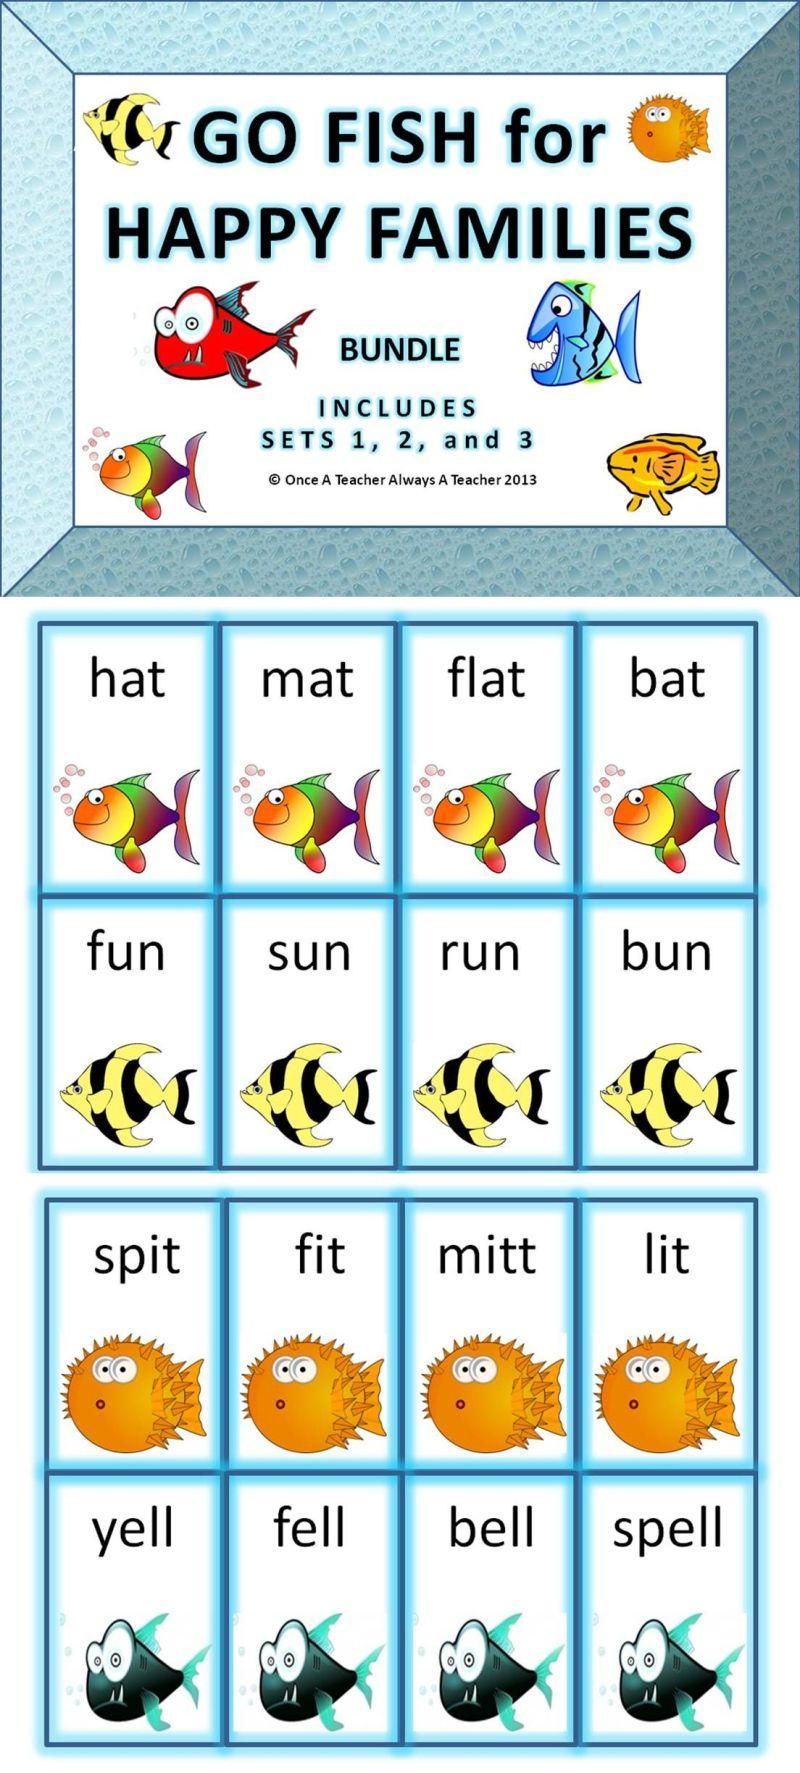 Go fish for happy families 3 set bundle fun